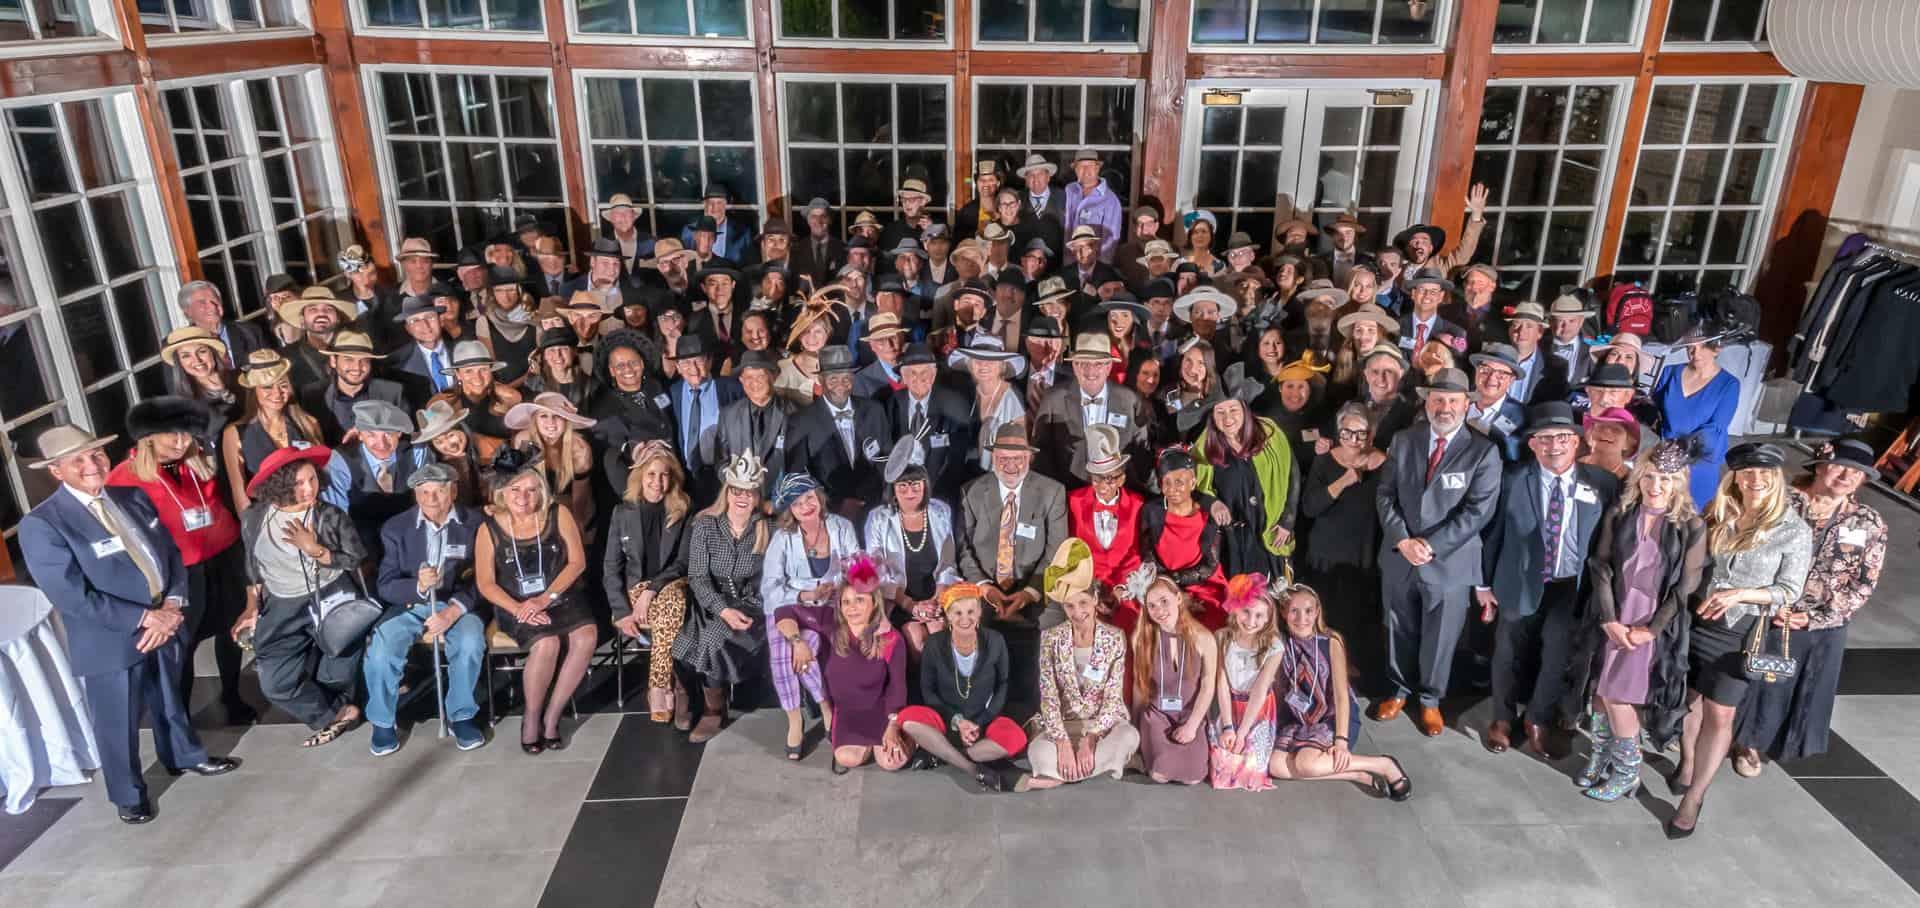 The Headwear Association 111th Annual Dinner Group Photo